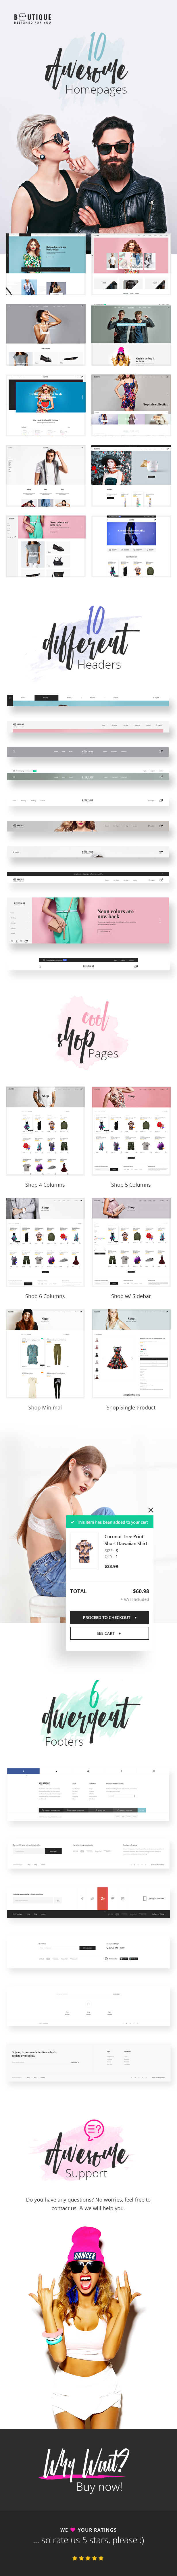 Boutique – eCommerce PSD Template - 1